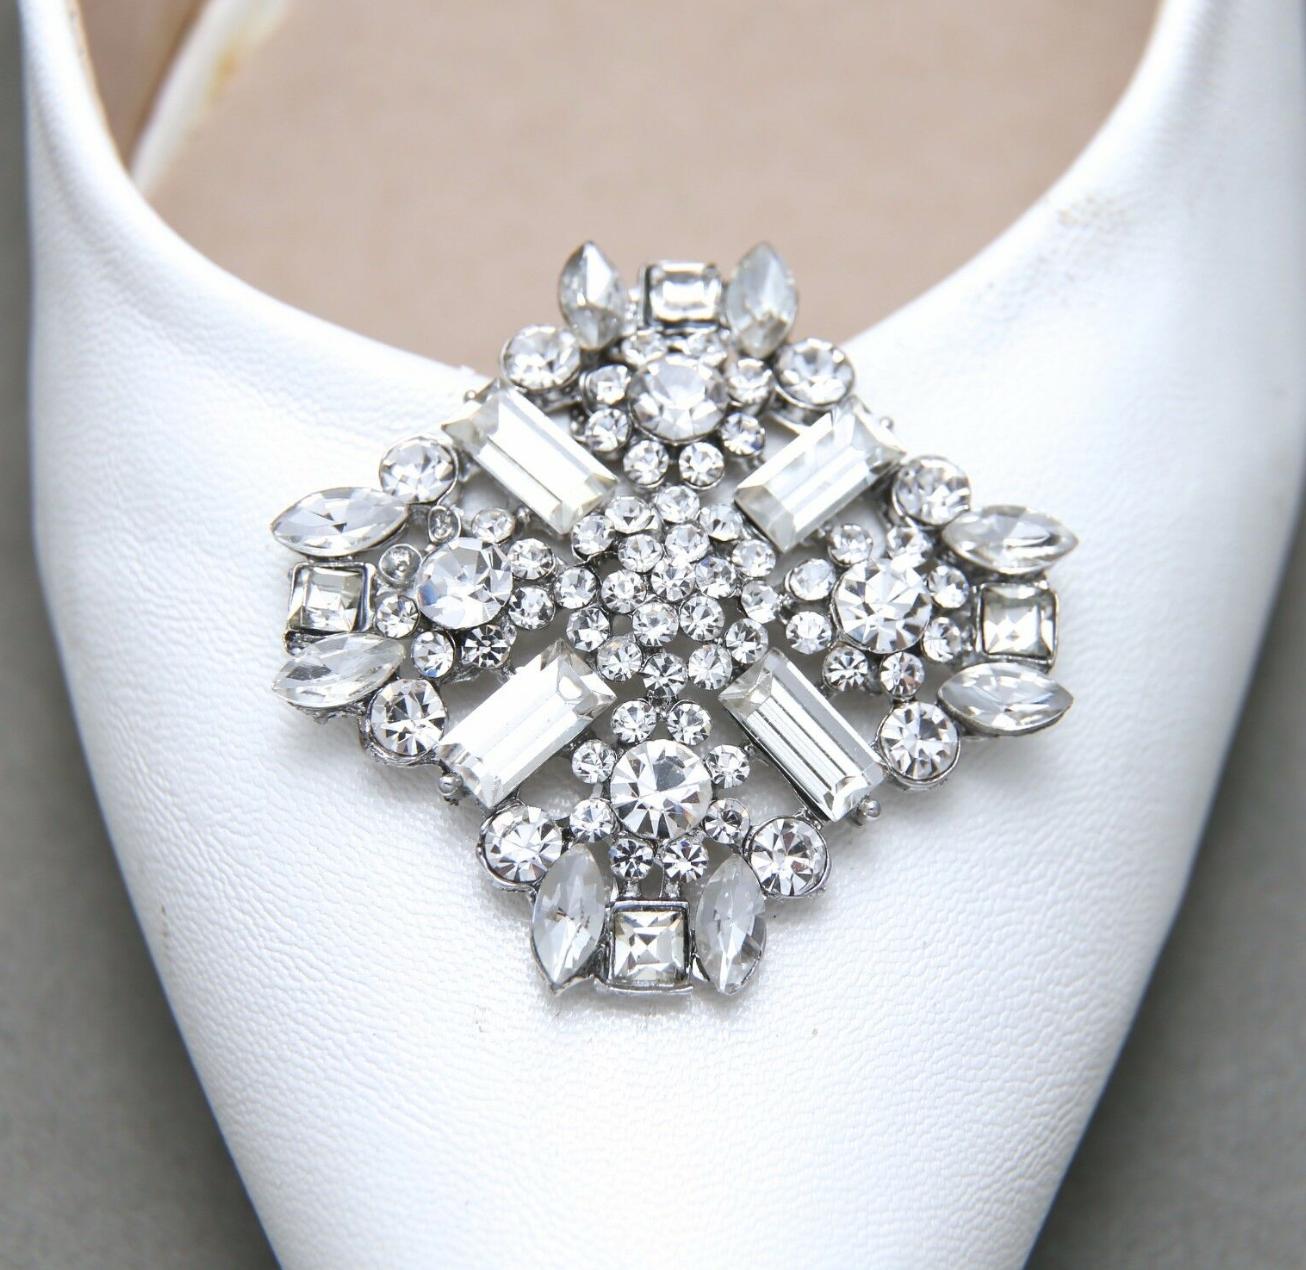 2 Pcs Vintage Style Rhinestone Wedding Bridal Diamante Crystal Silver Shoe Clips